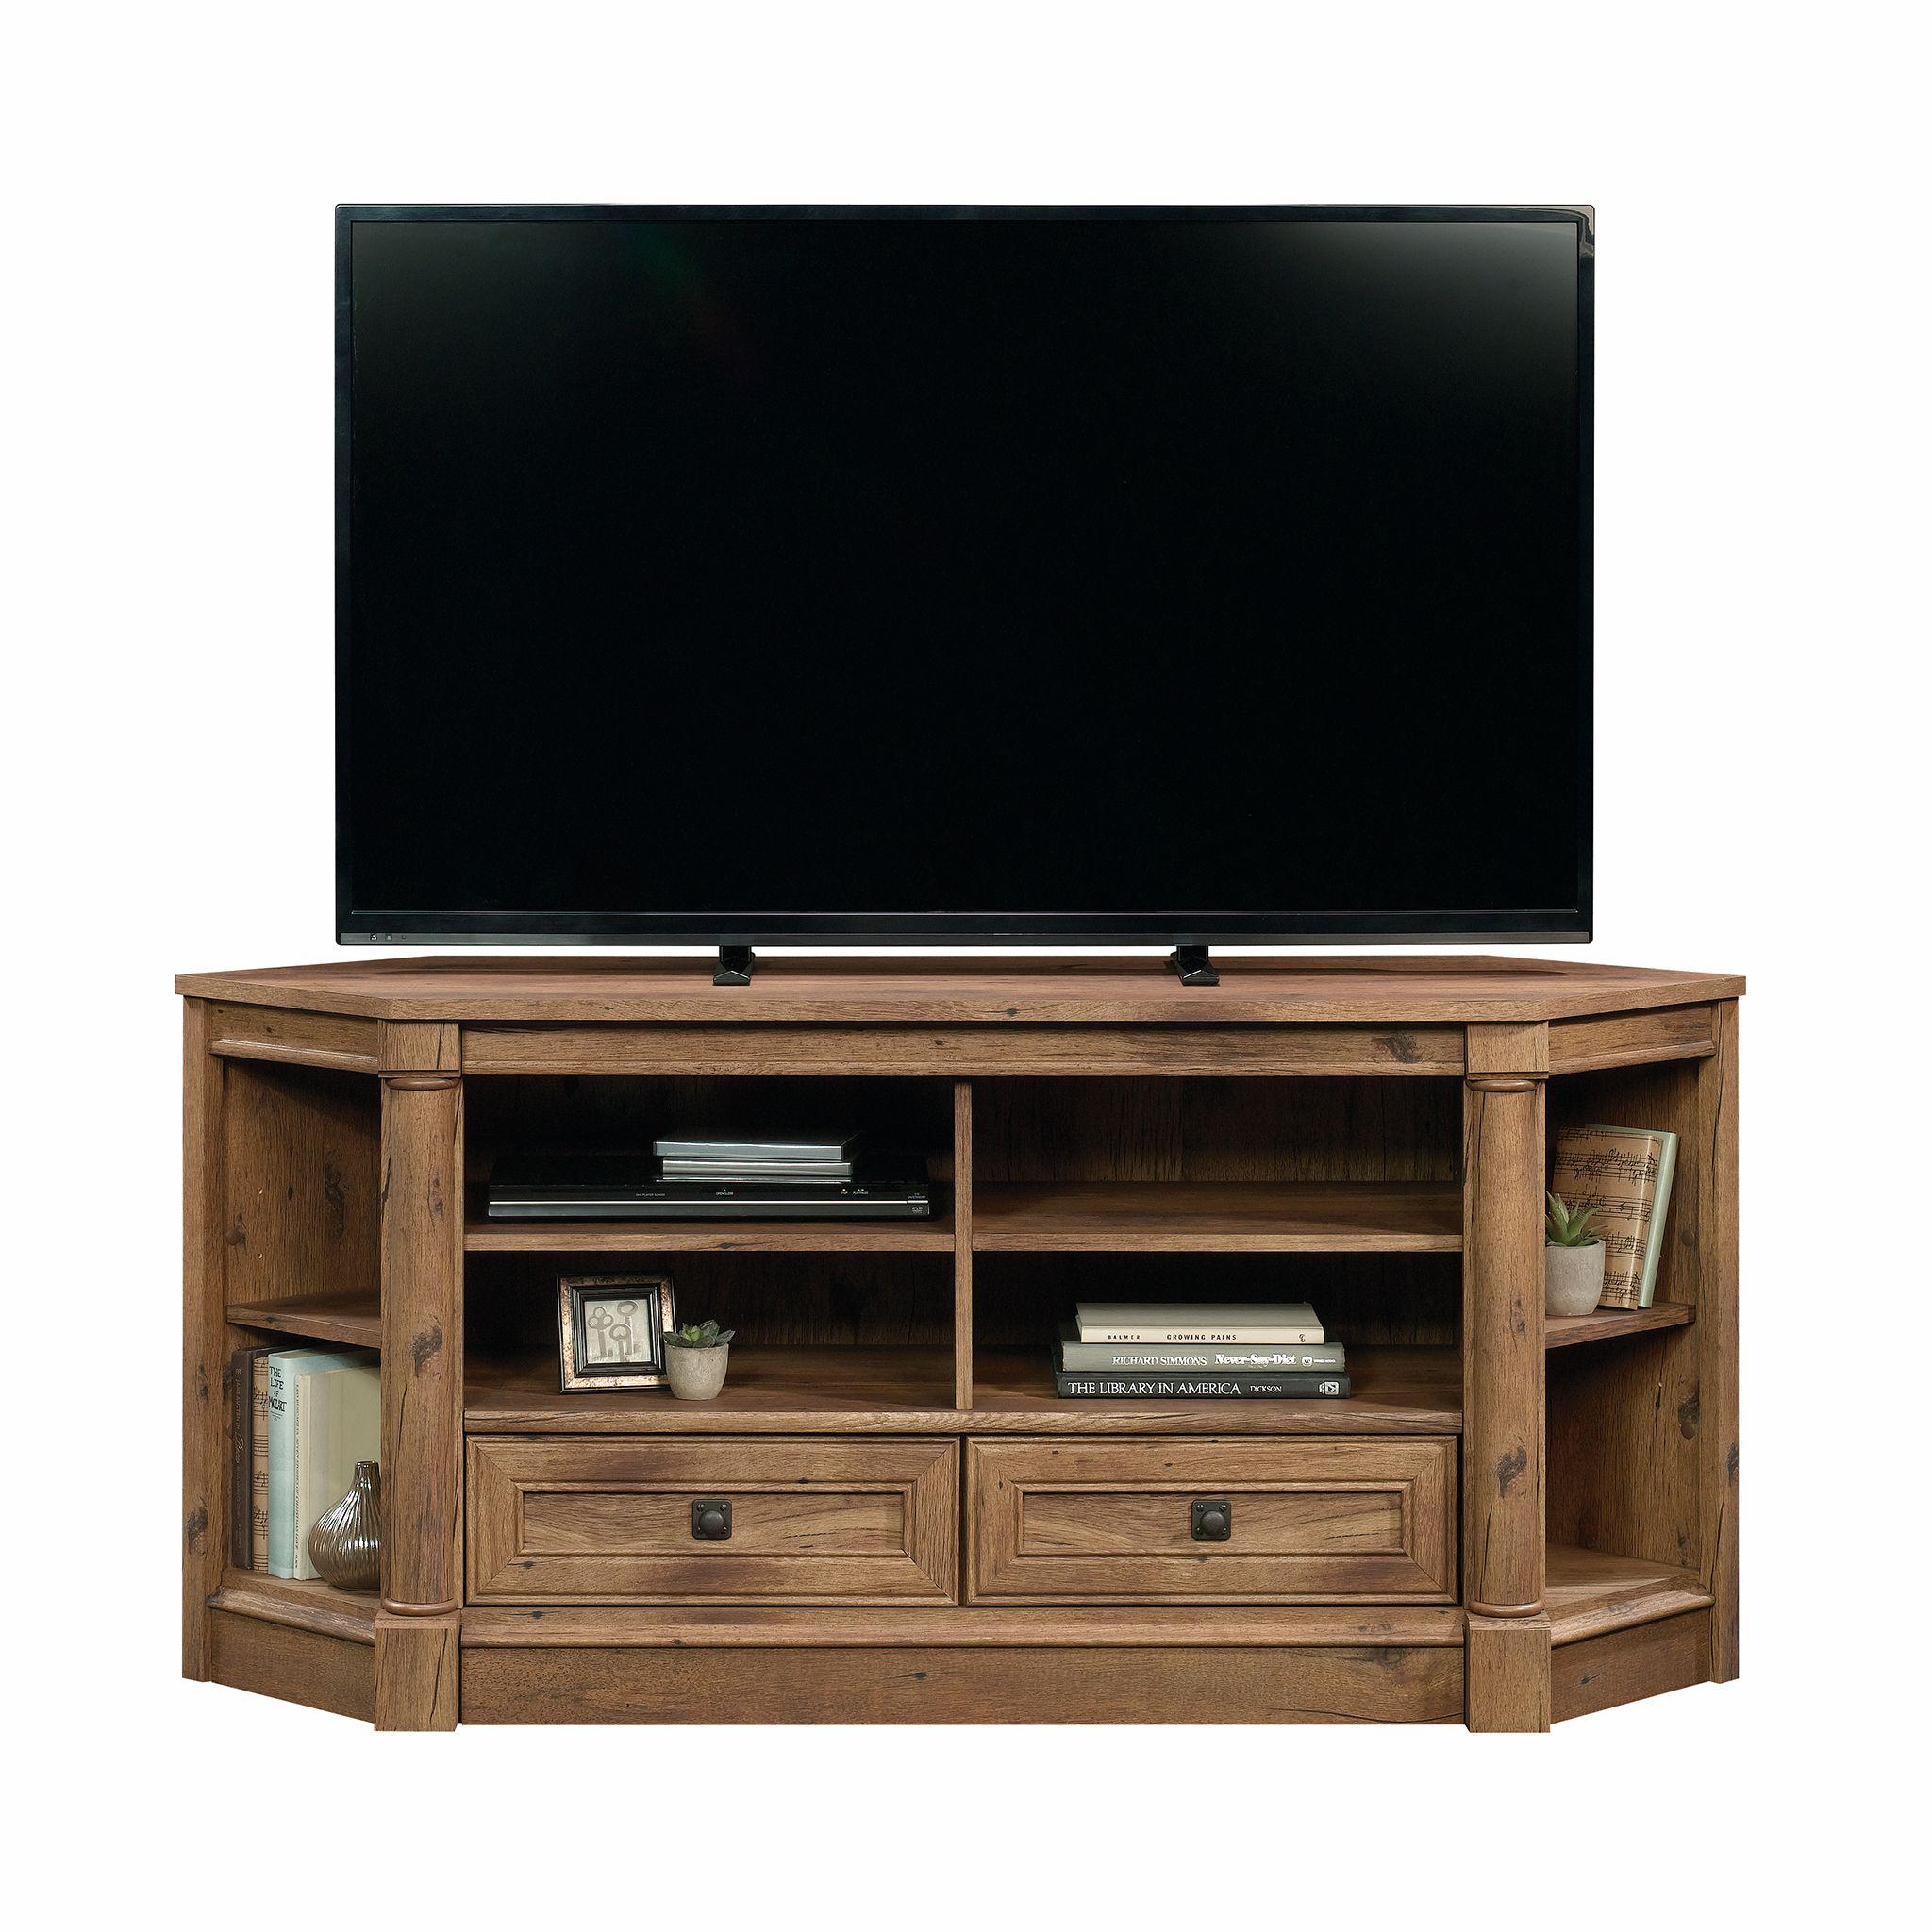 Sauder Palladia Corner Tv Stand For Tvs Up To 60 Vintage Oak Finish Walmart Com Corner Tv Corner Tv Stand Corner Tv Stands